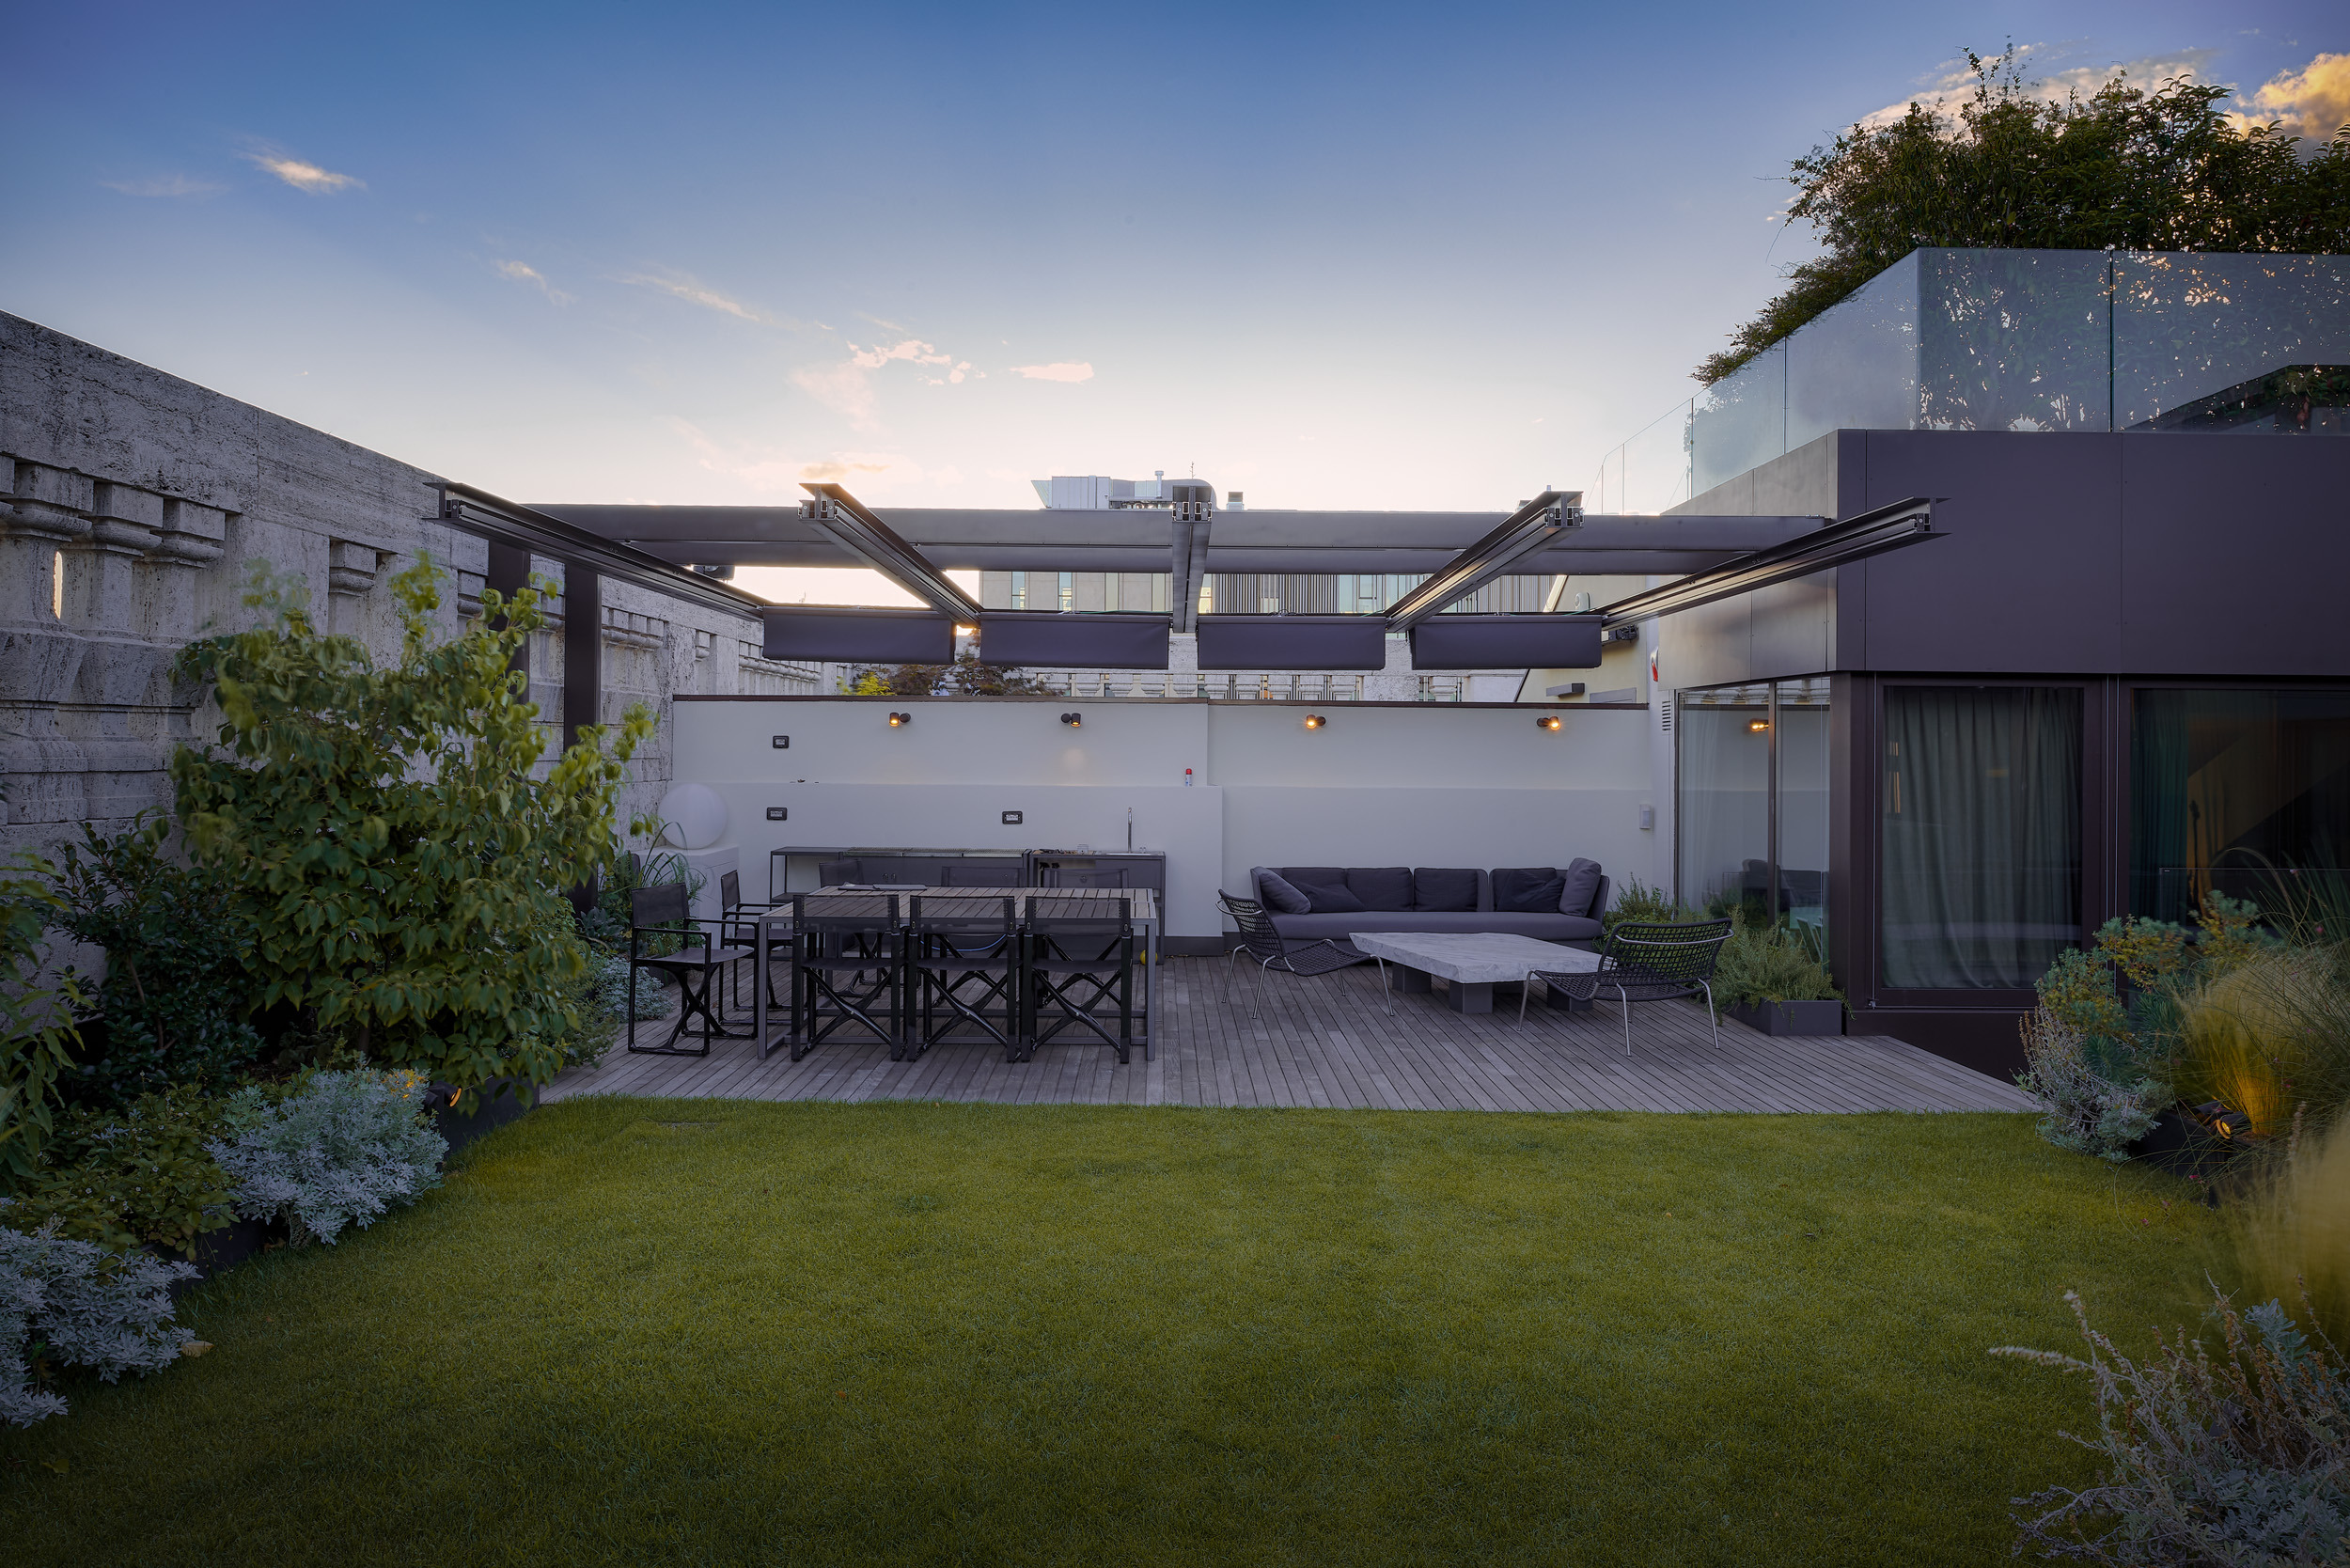 1558698437 194 create a beautiful backyard that makes relaxing stylish and comfortable - Create a Beautiful Backyard That Makes Relaxing Stylish and Comfortable